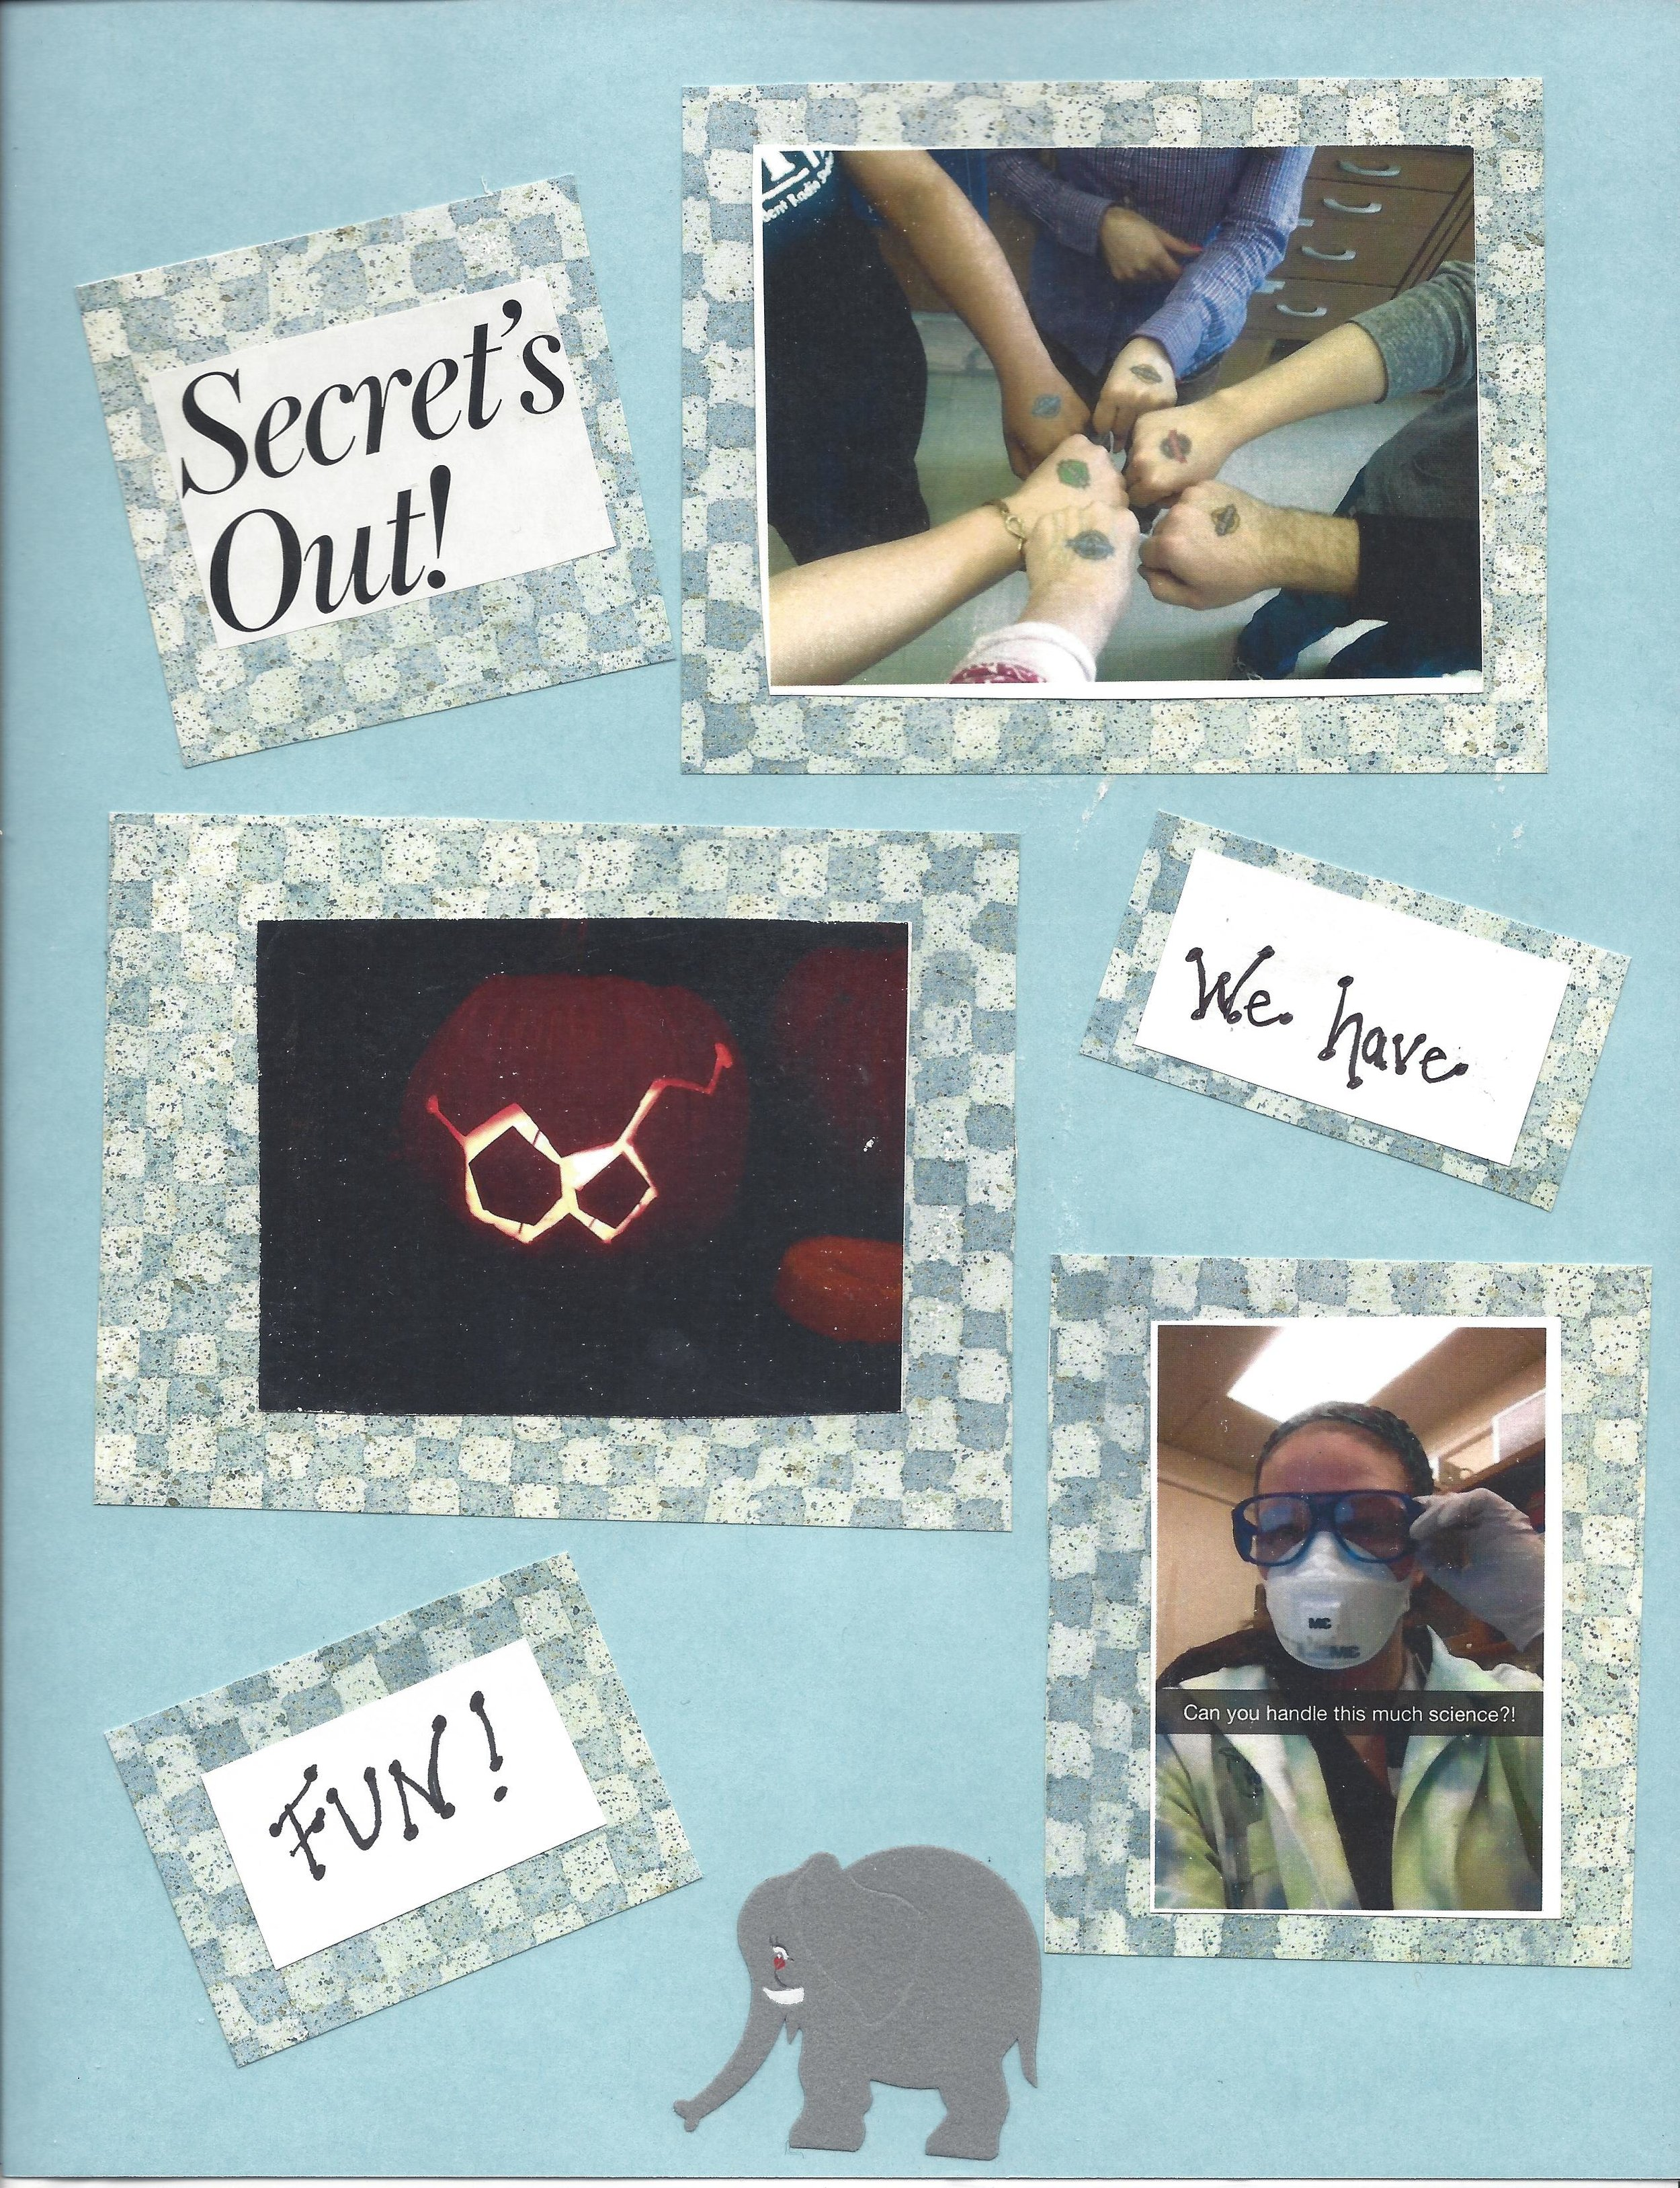 secrets out.jpg